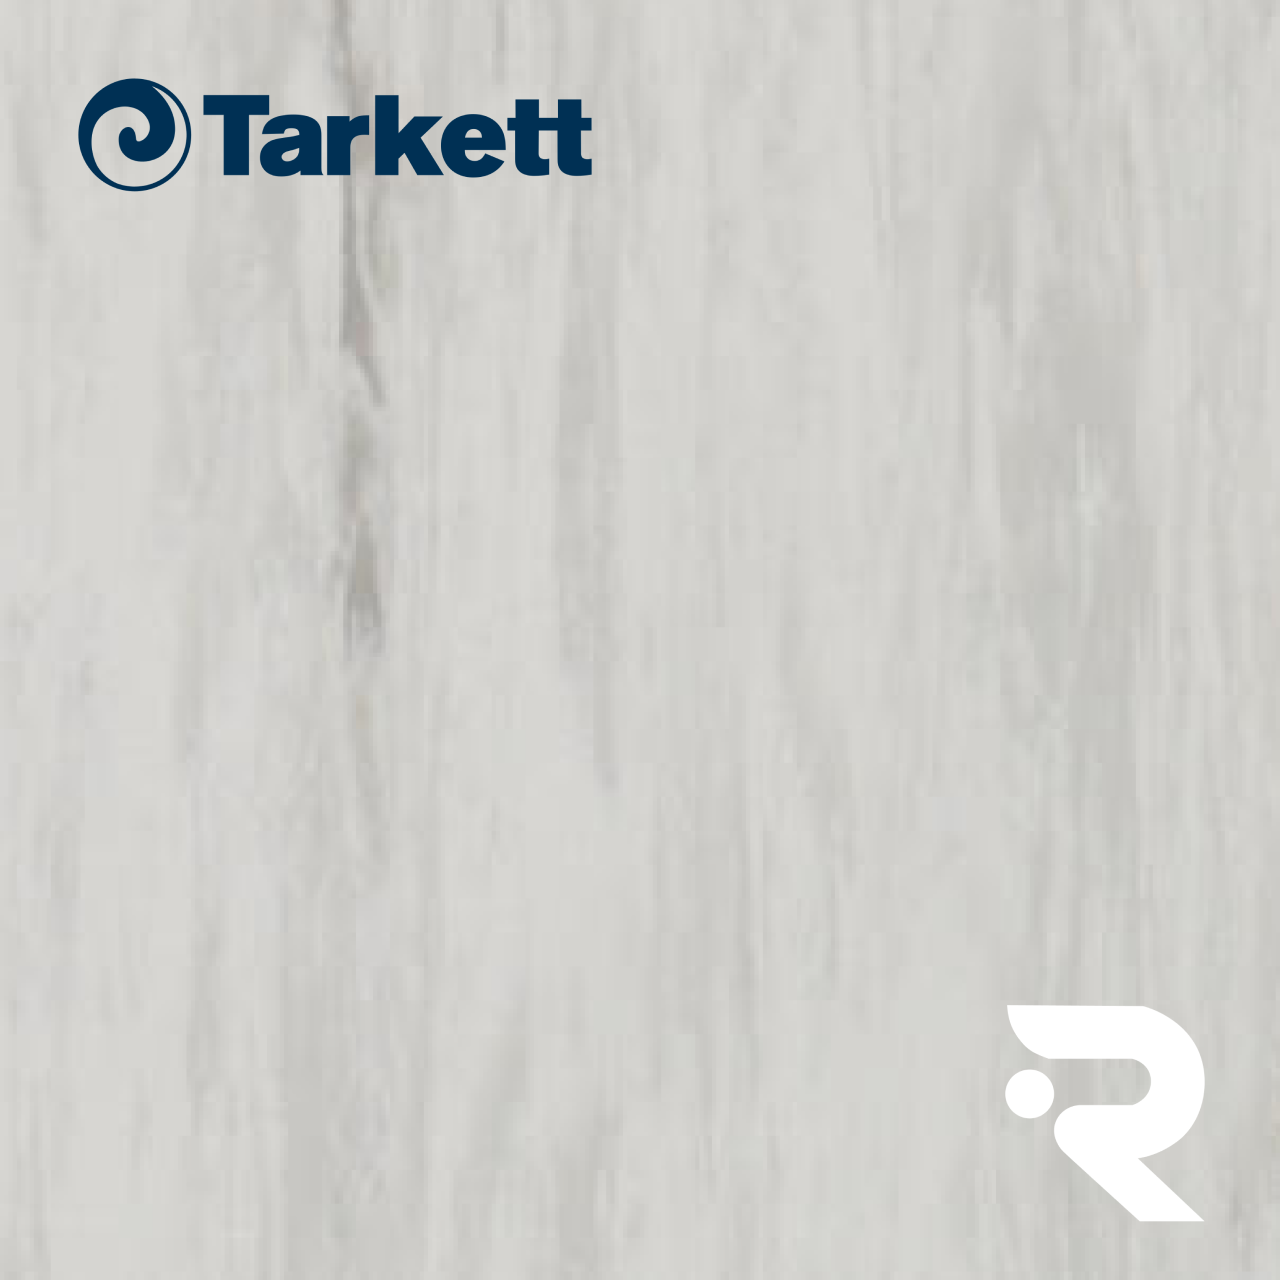 🏫 Гомогенный линолеум Tarkett | Standard STONE GREY 0924 | Standard Plus 2.0 mm | 2 х 23 м